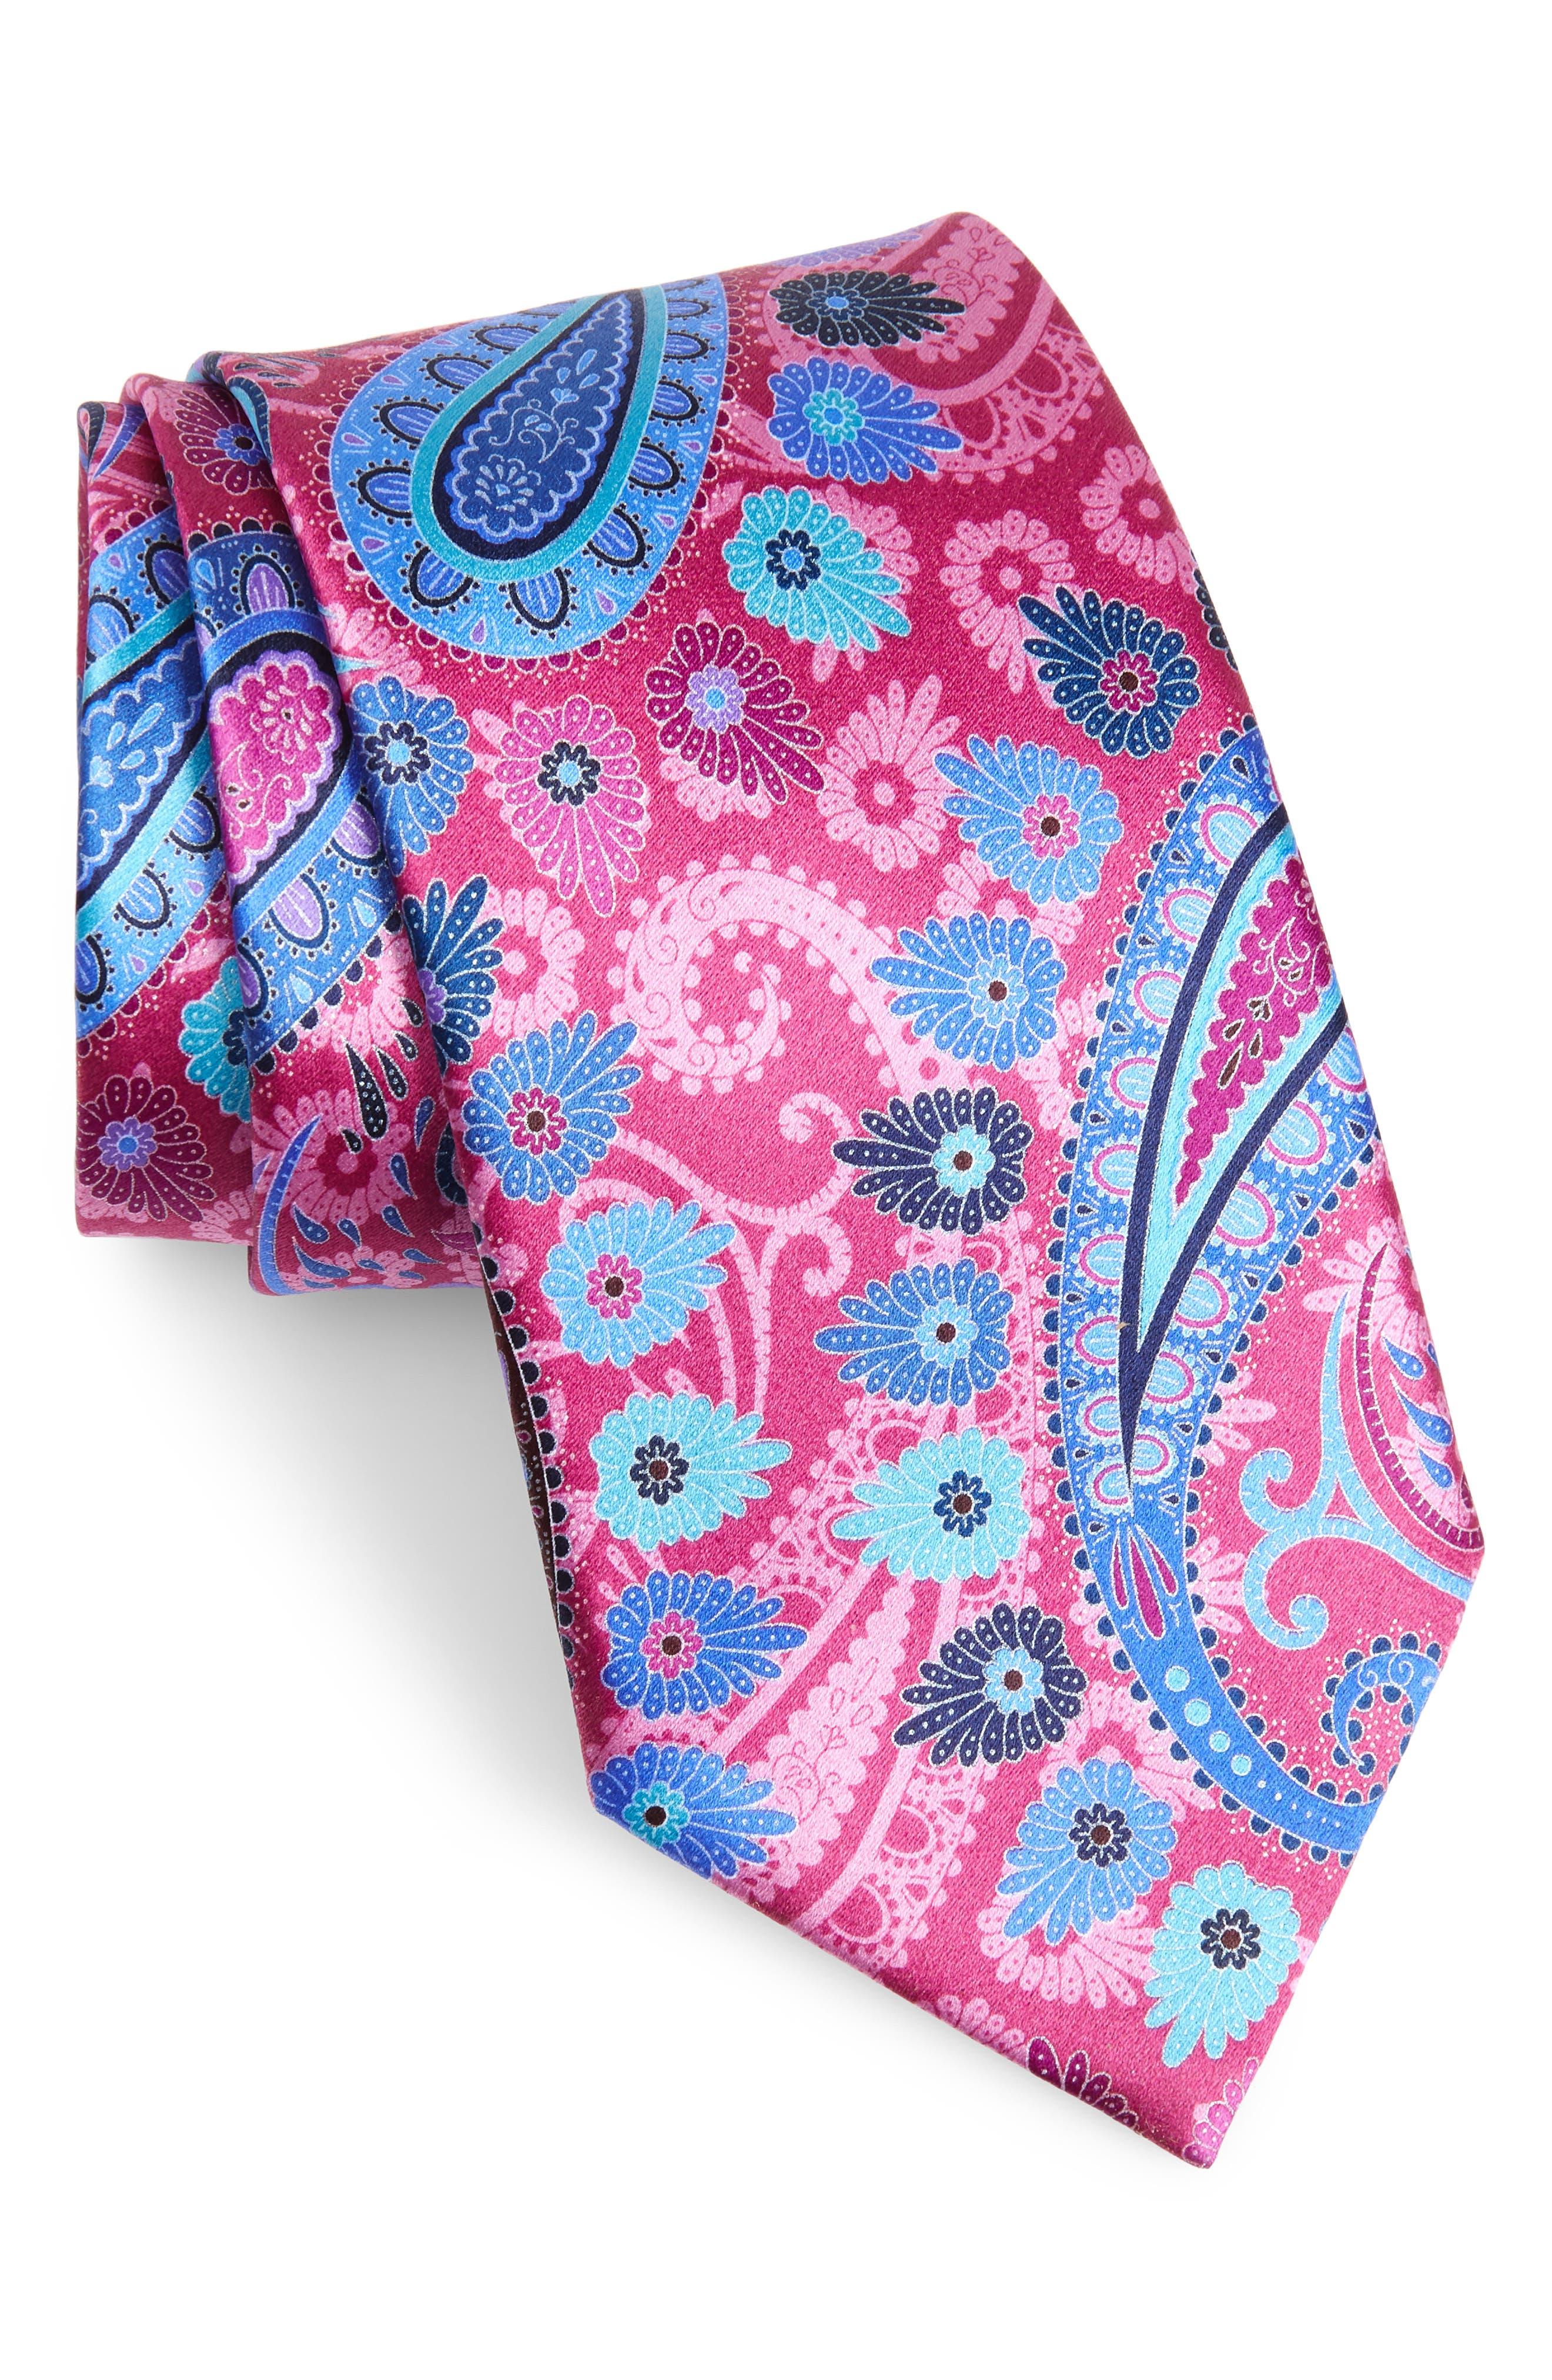 ERMENEGILDO ZEGNA, Quindici Paisley Silk Tie, Main thumbnail 1, color, PINK